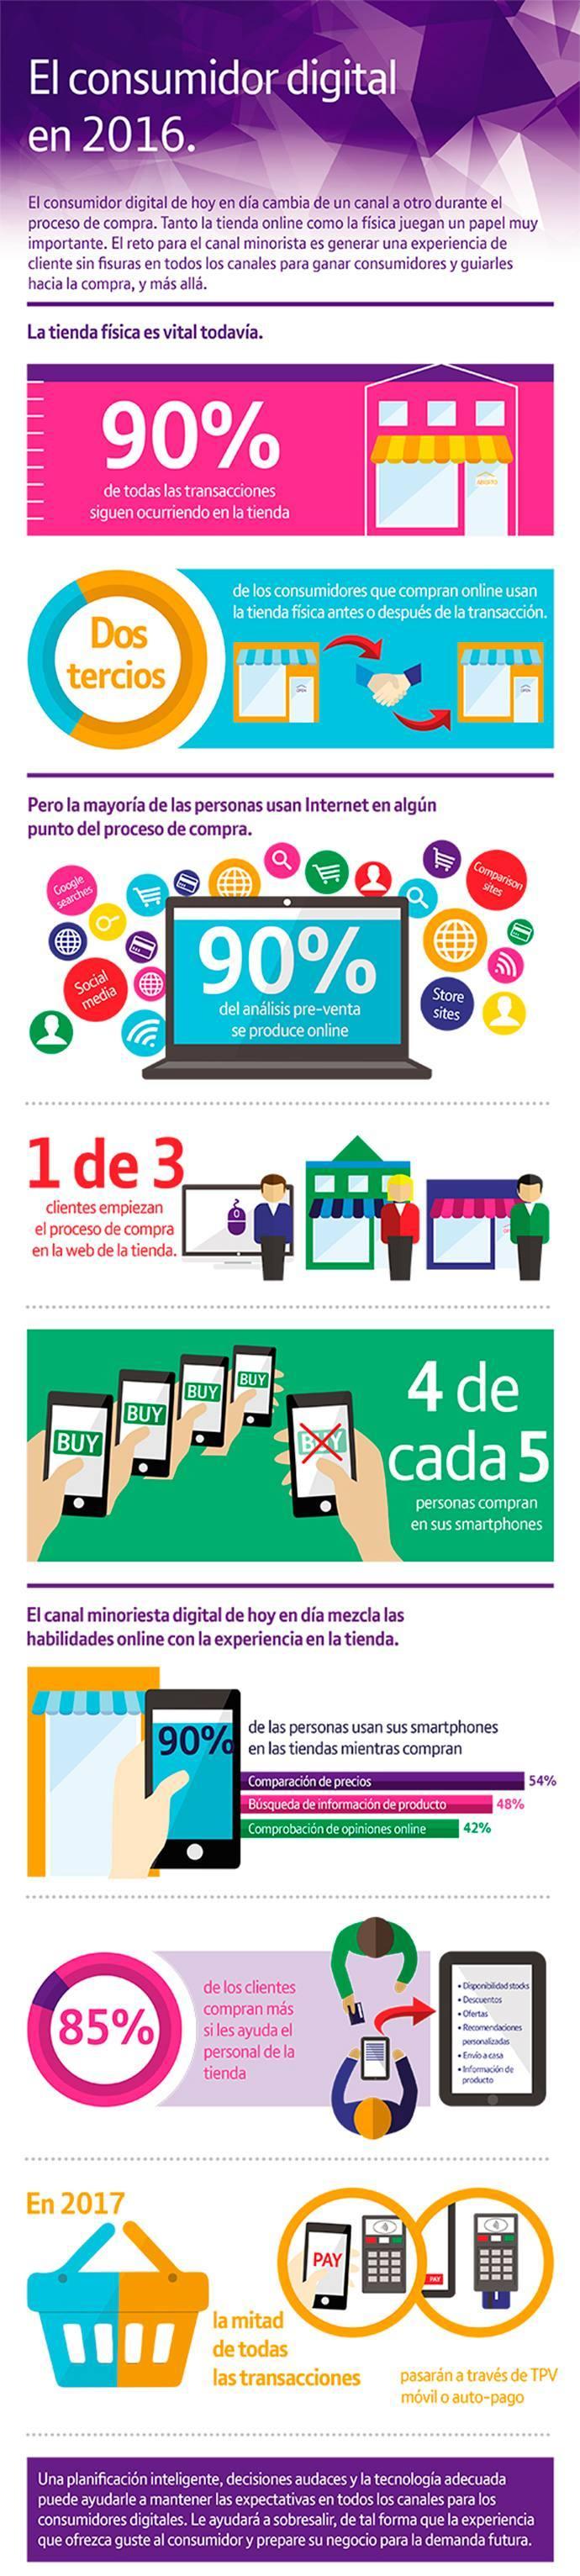 infografía-consumidor-digital